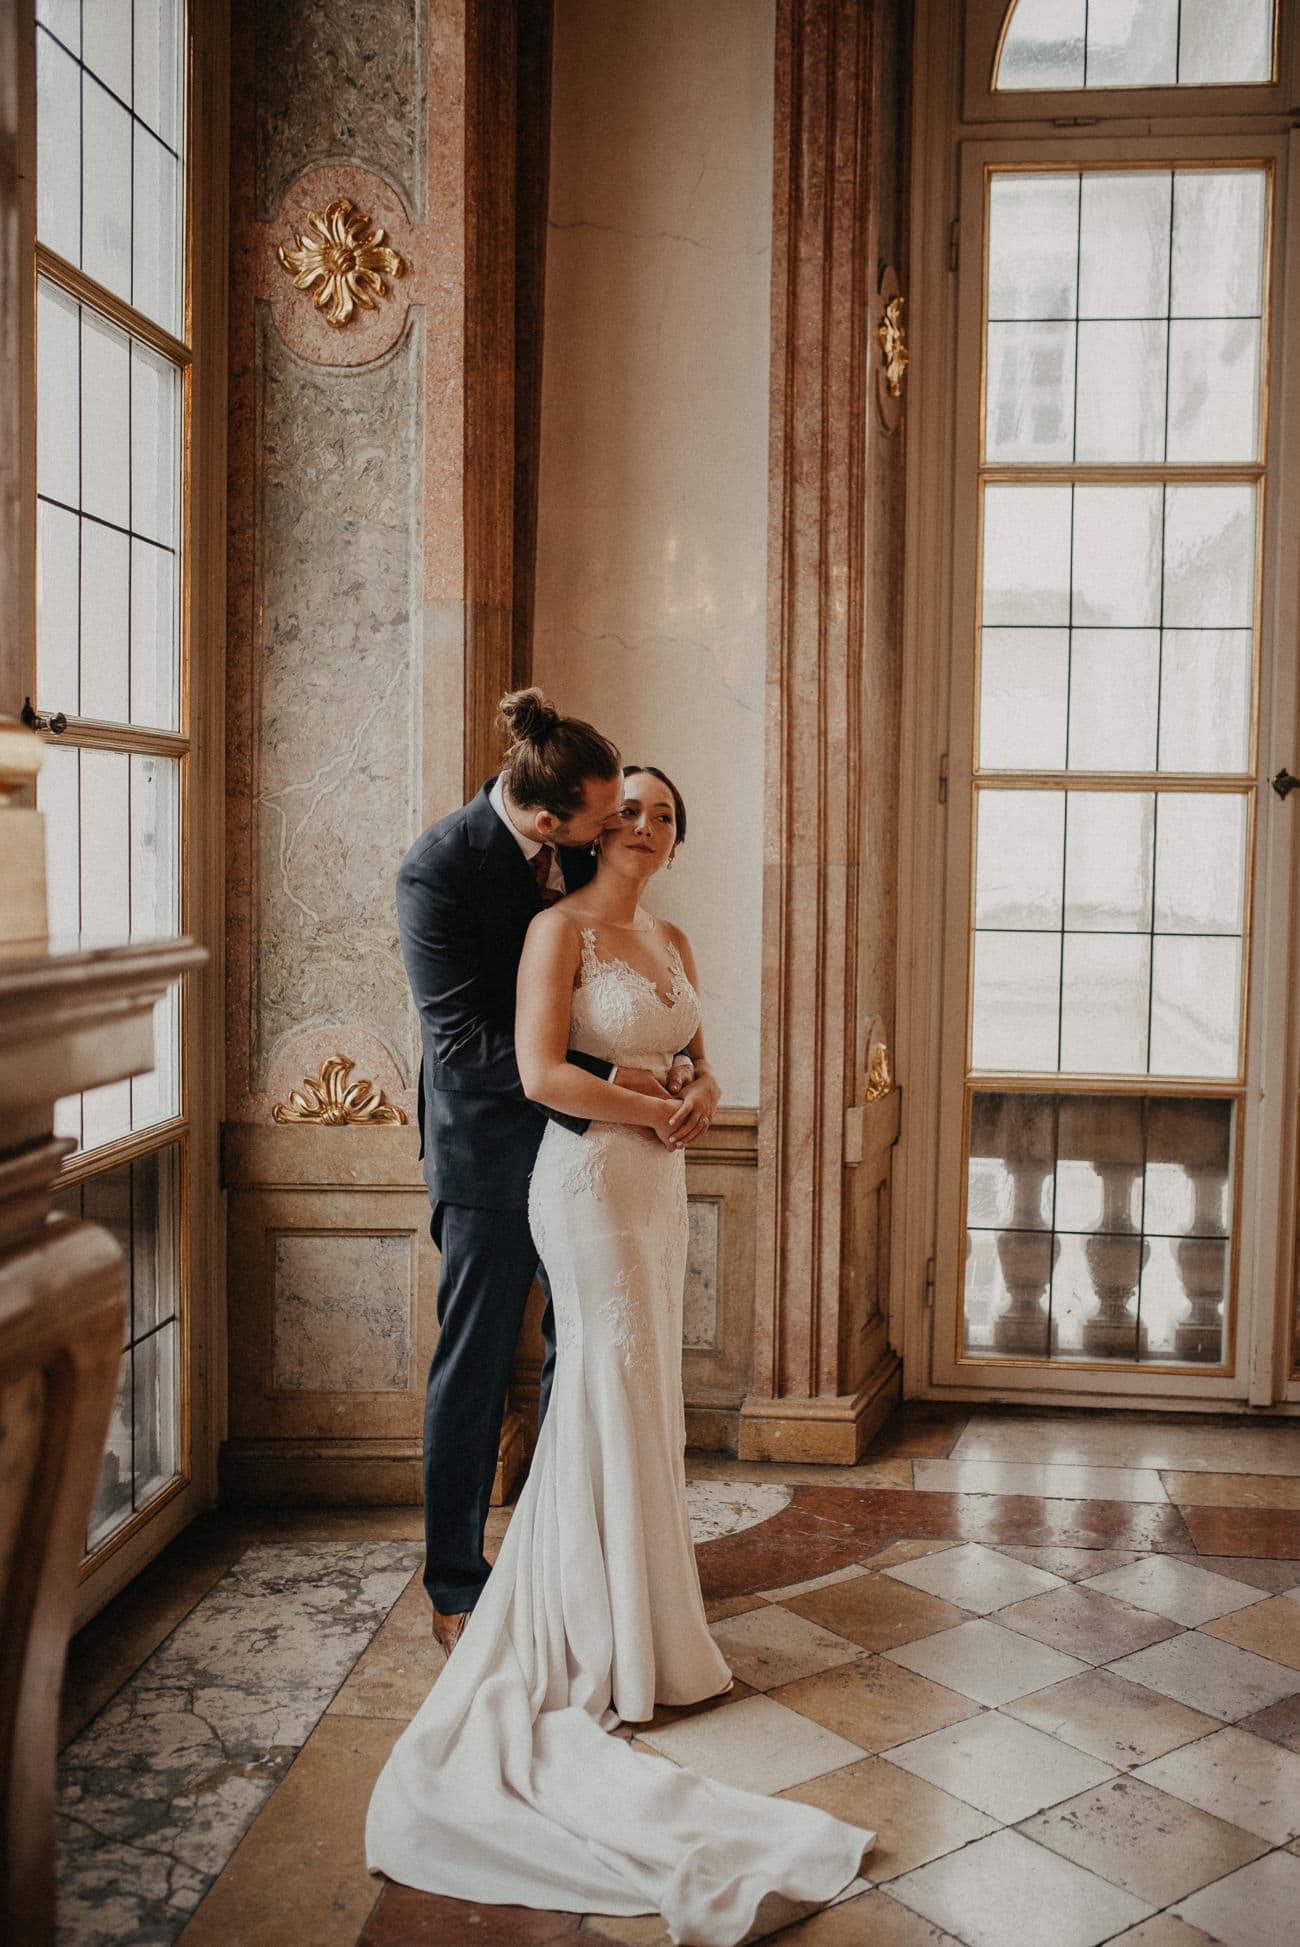 Verlobungs Session in Schloss Mirabell Salzburg